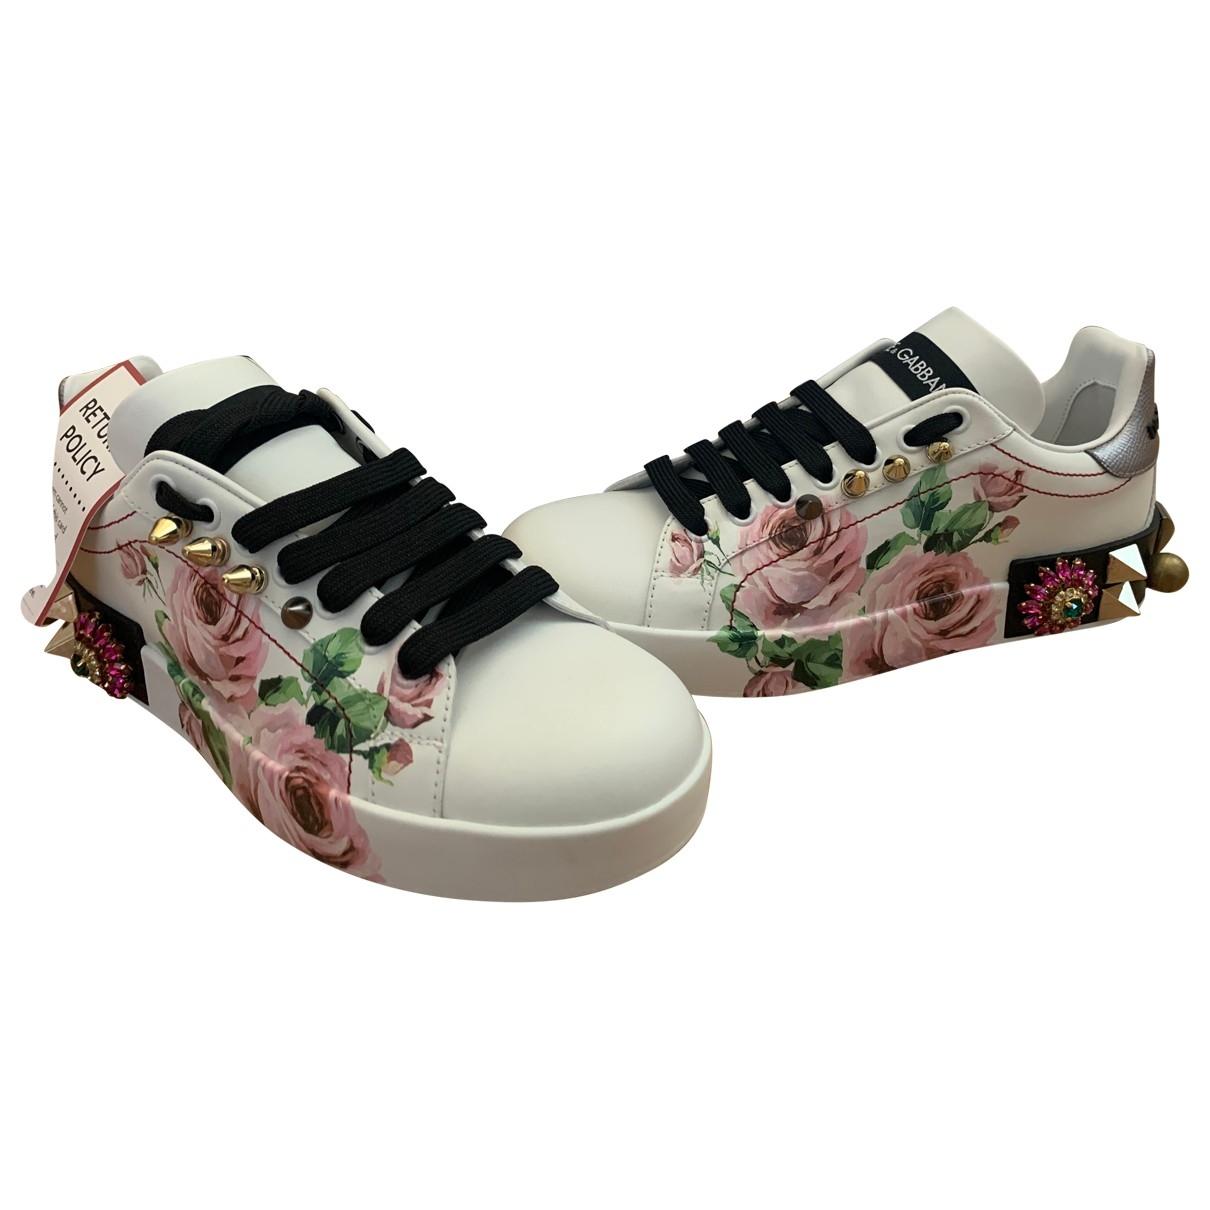 Dolce & Gabbana - Baskets Portofino pour femme en cuir - rose